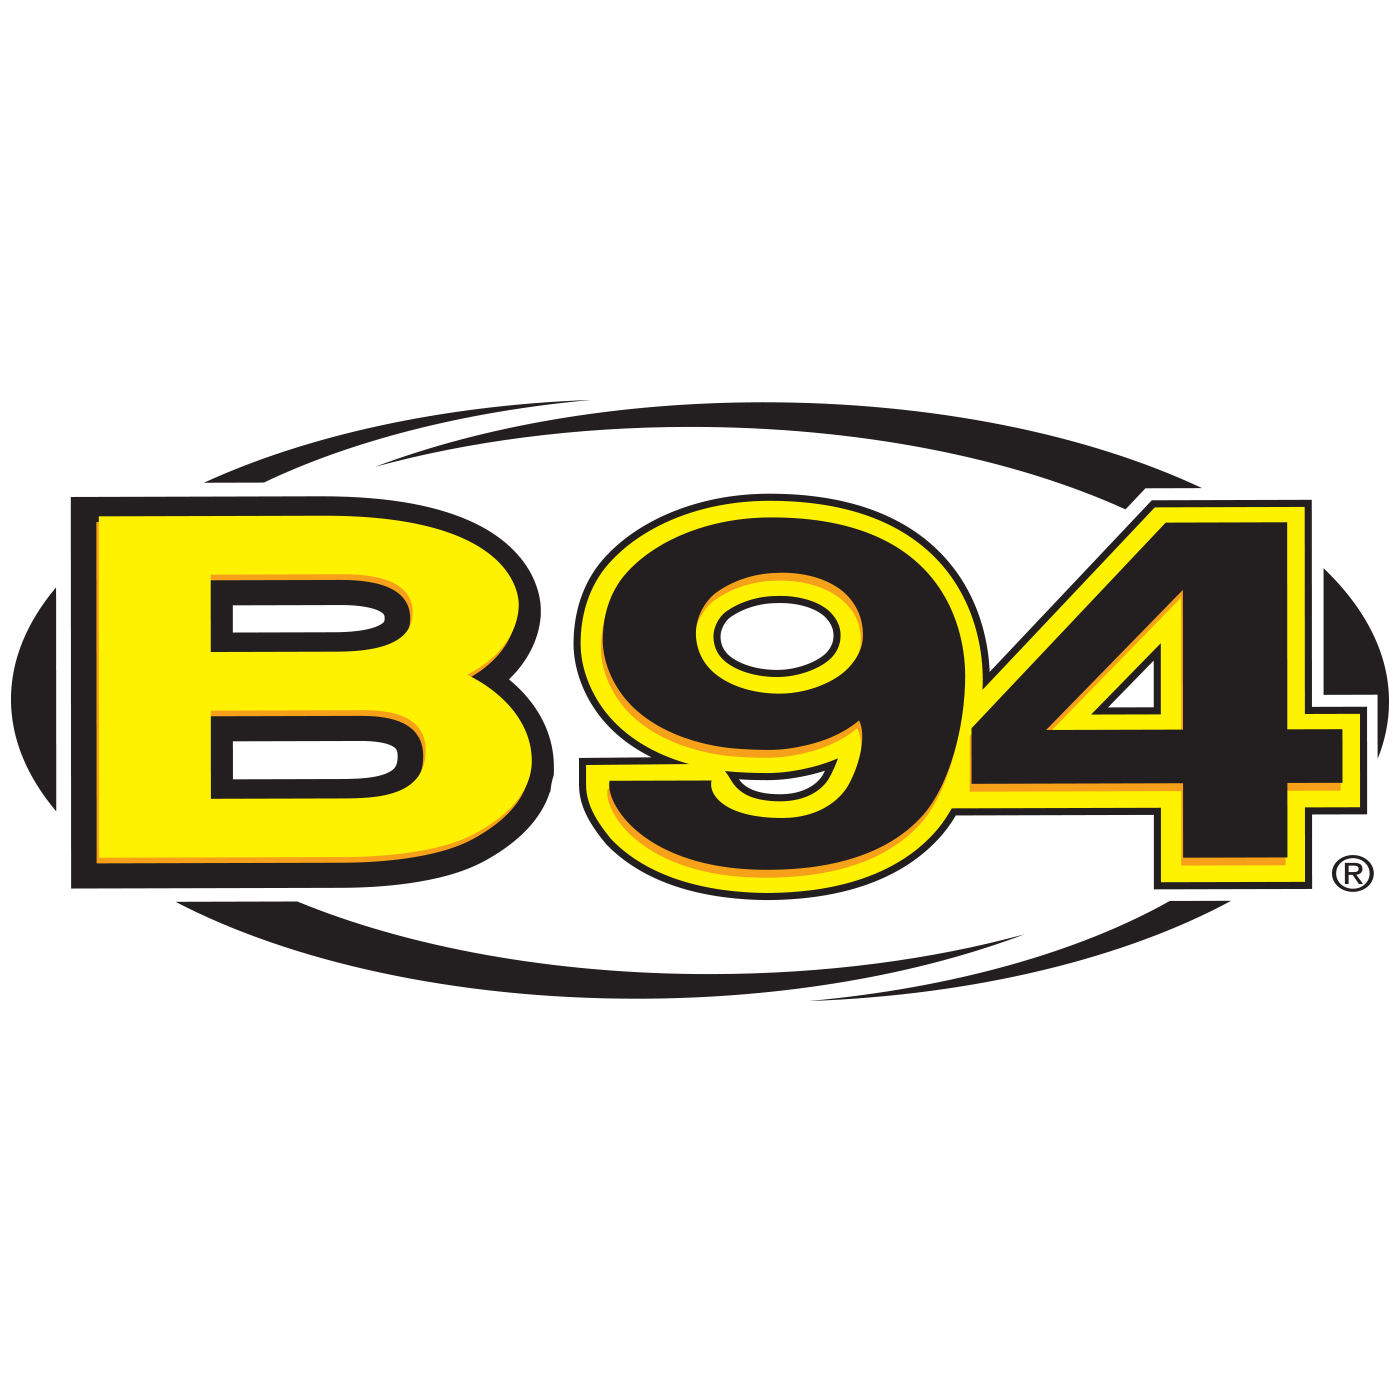 b94 on radio com